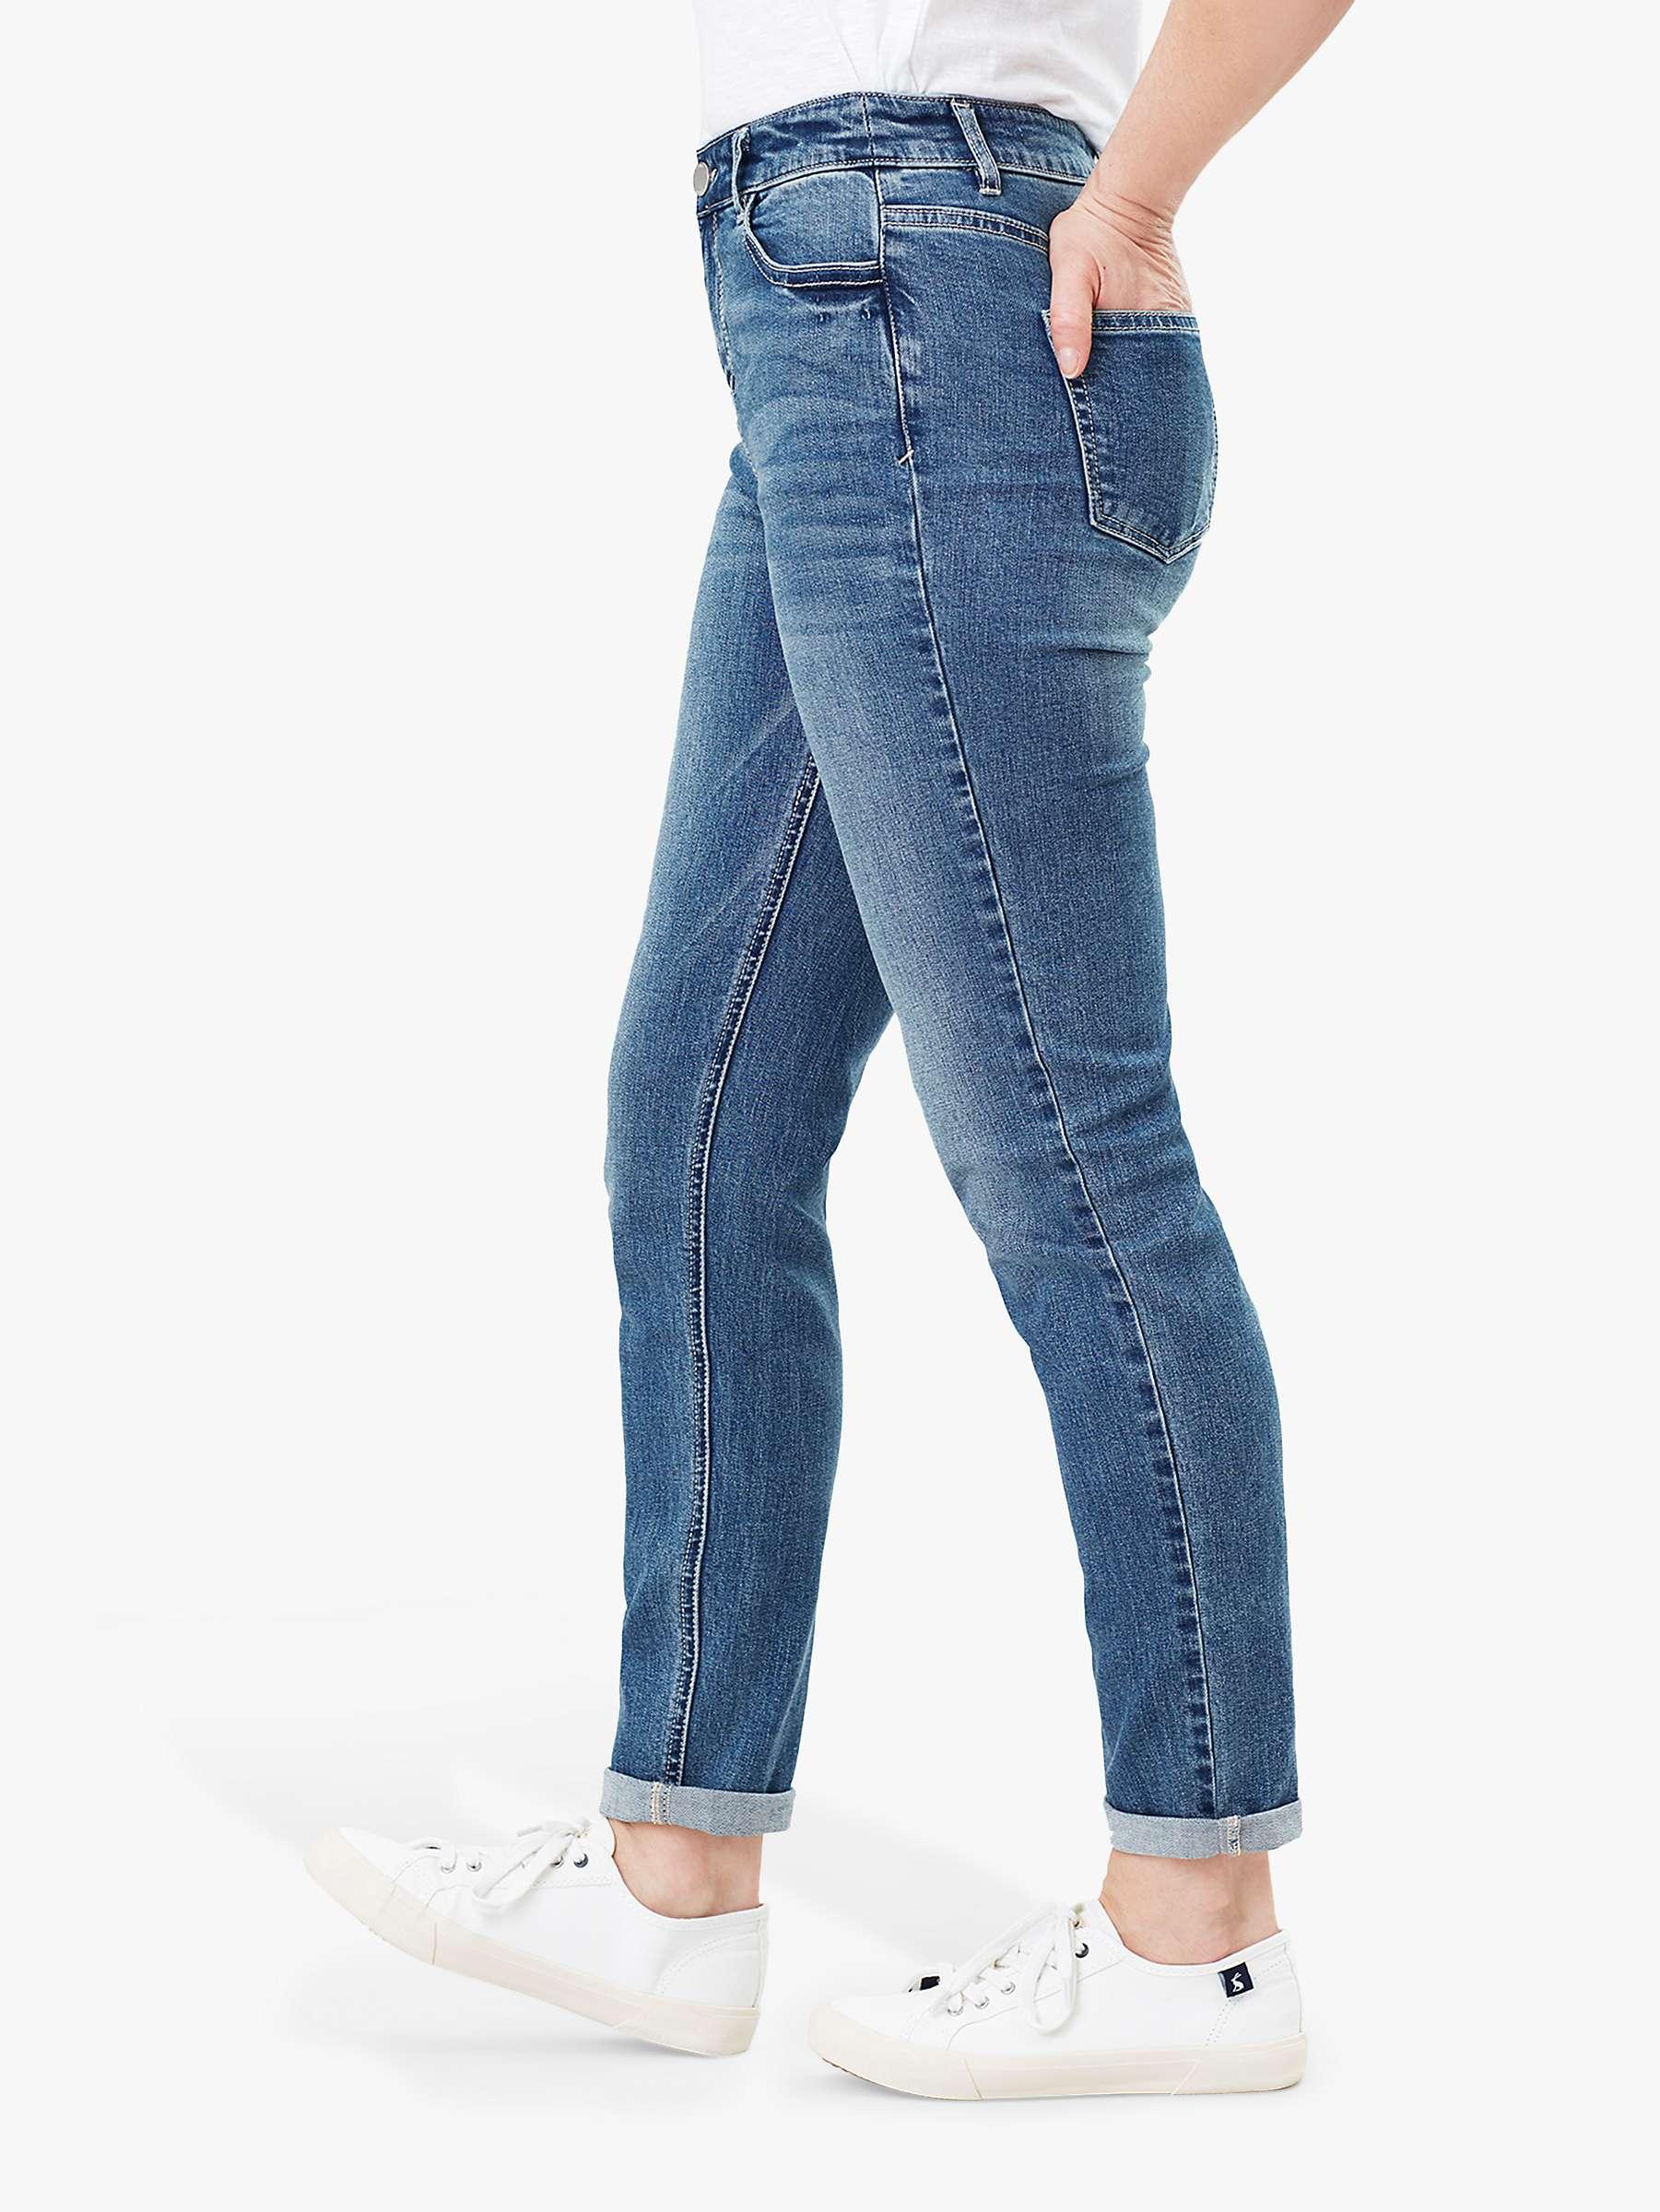 Joules Mens Five Pocket Jeans in Washed Denim Size 30